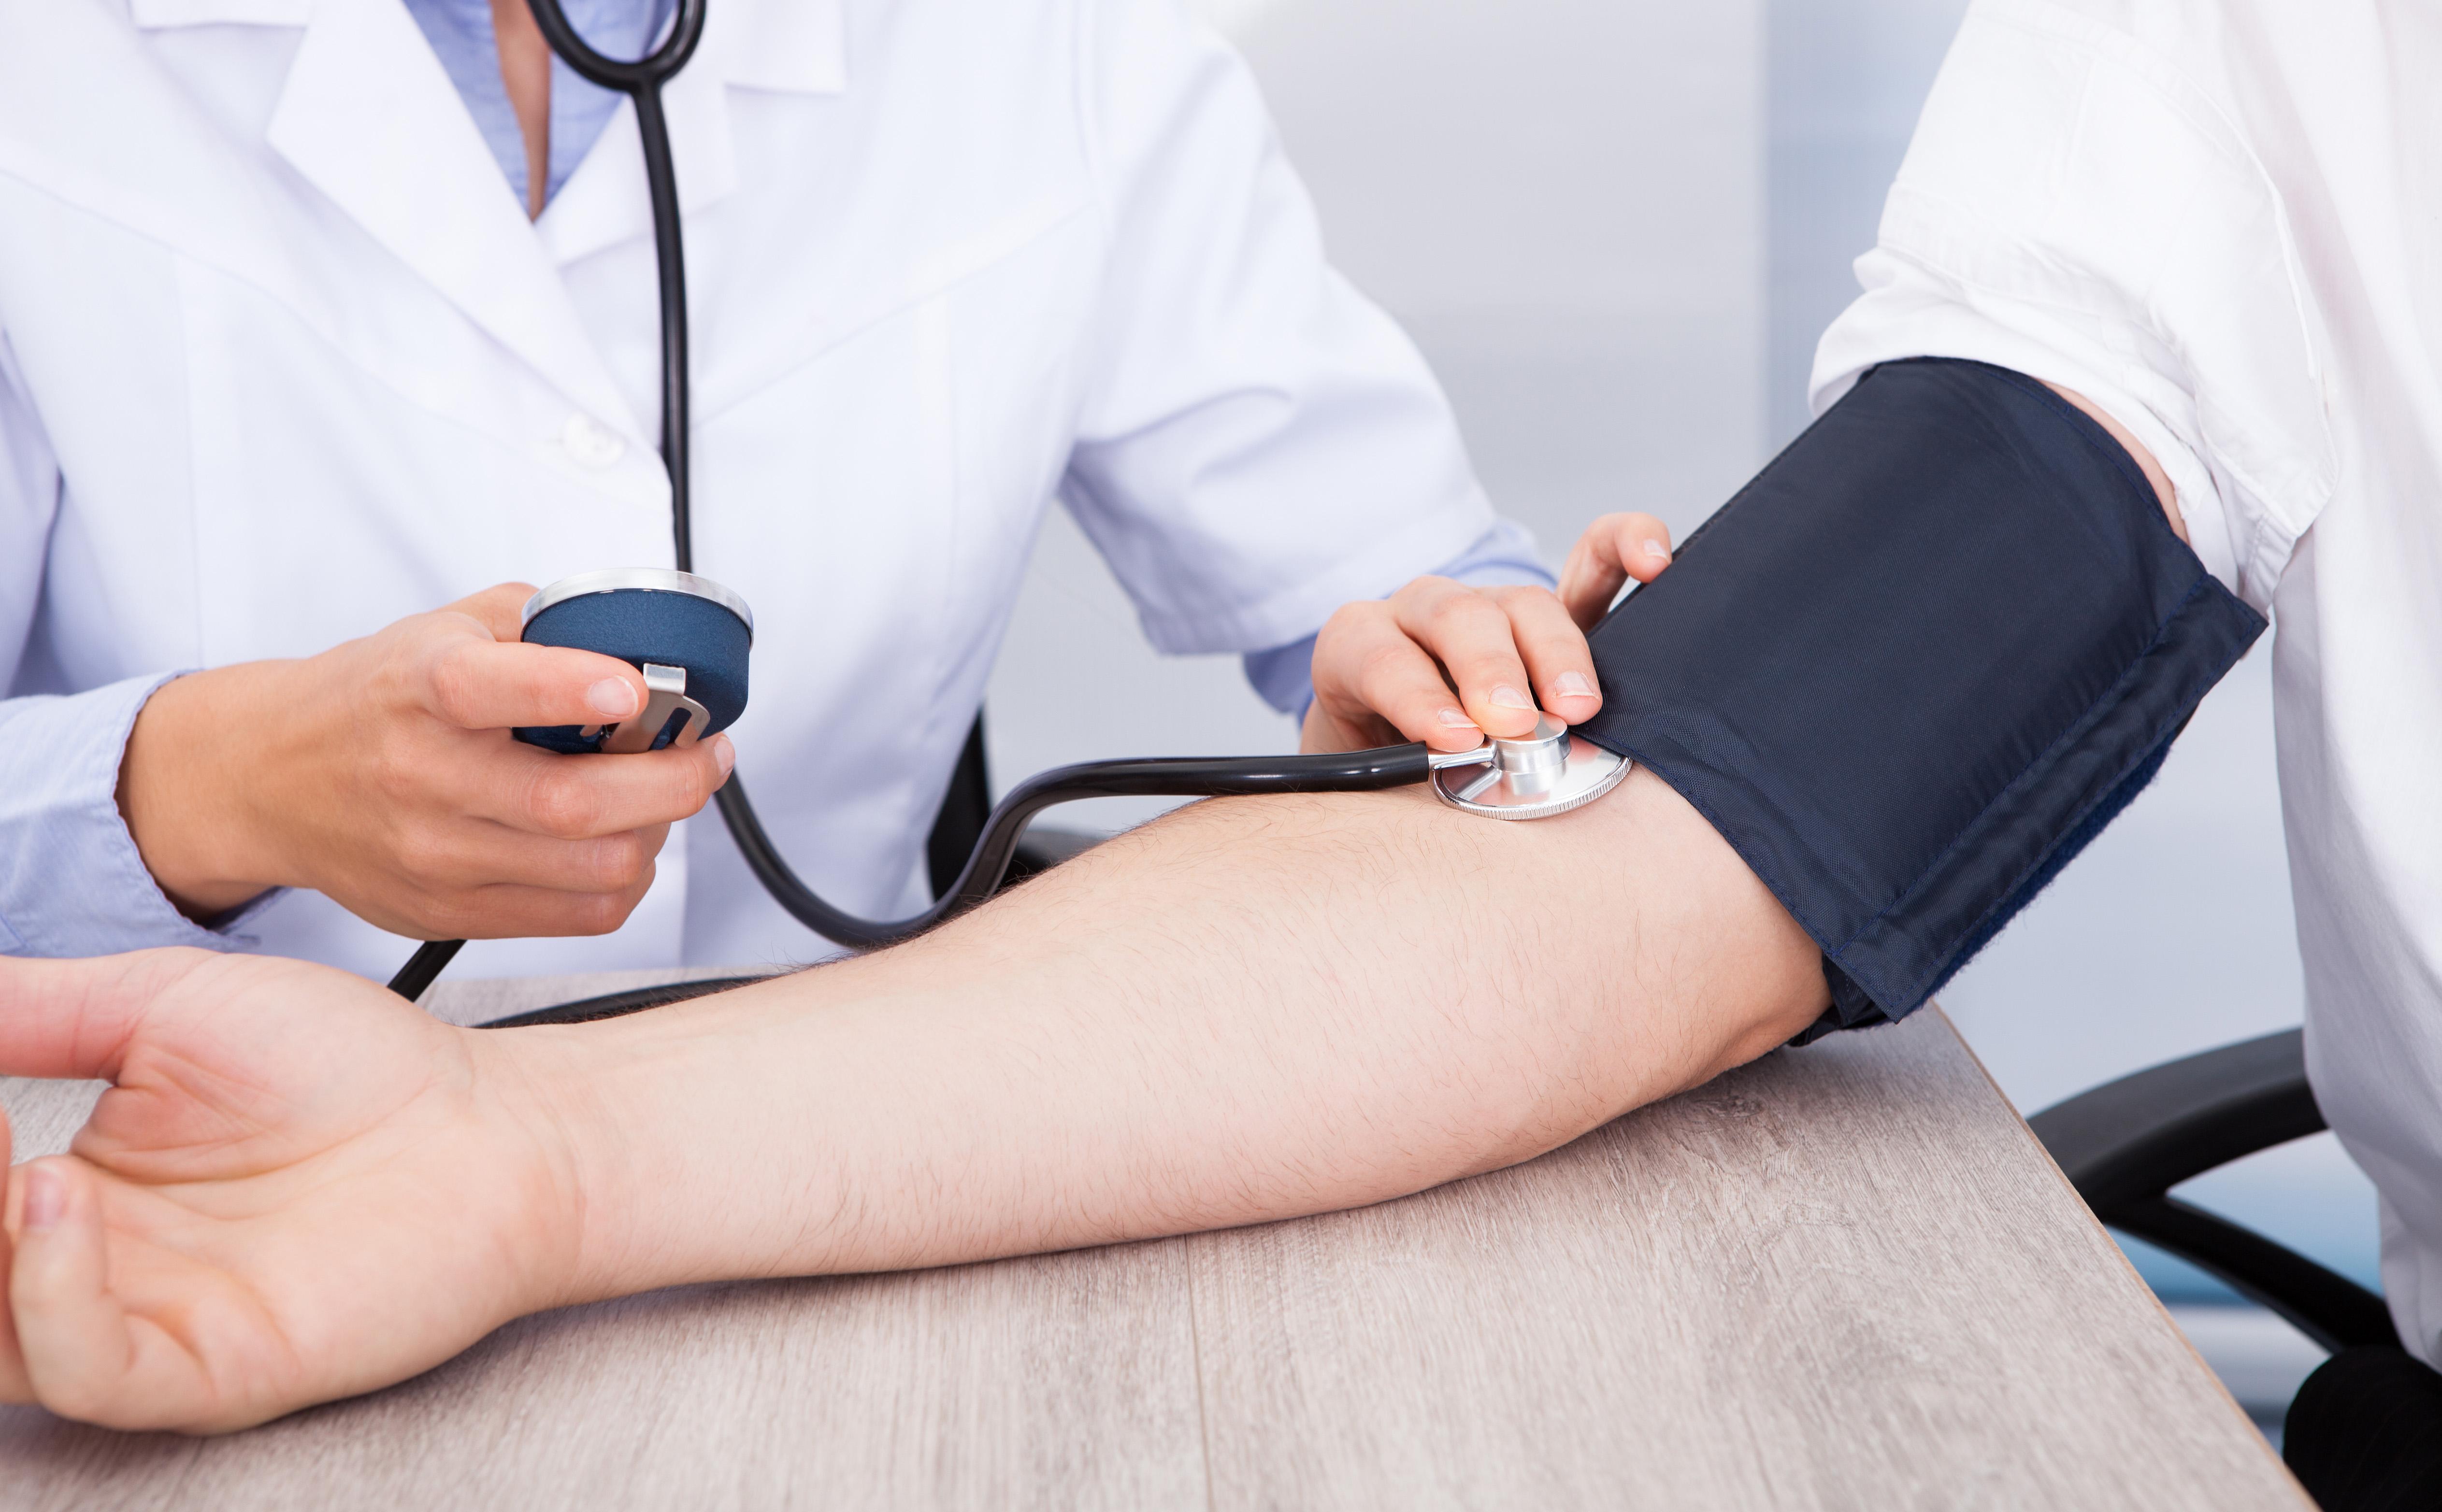 magas vérnyomás és rhesus faktor fizikai aktivitás és magas vérnyomás